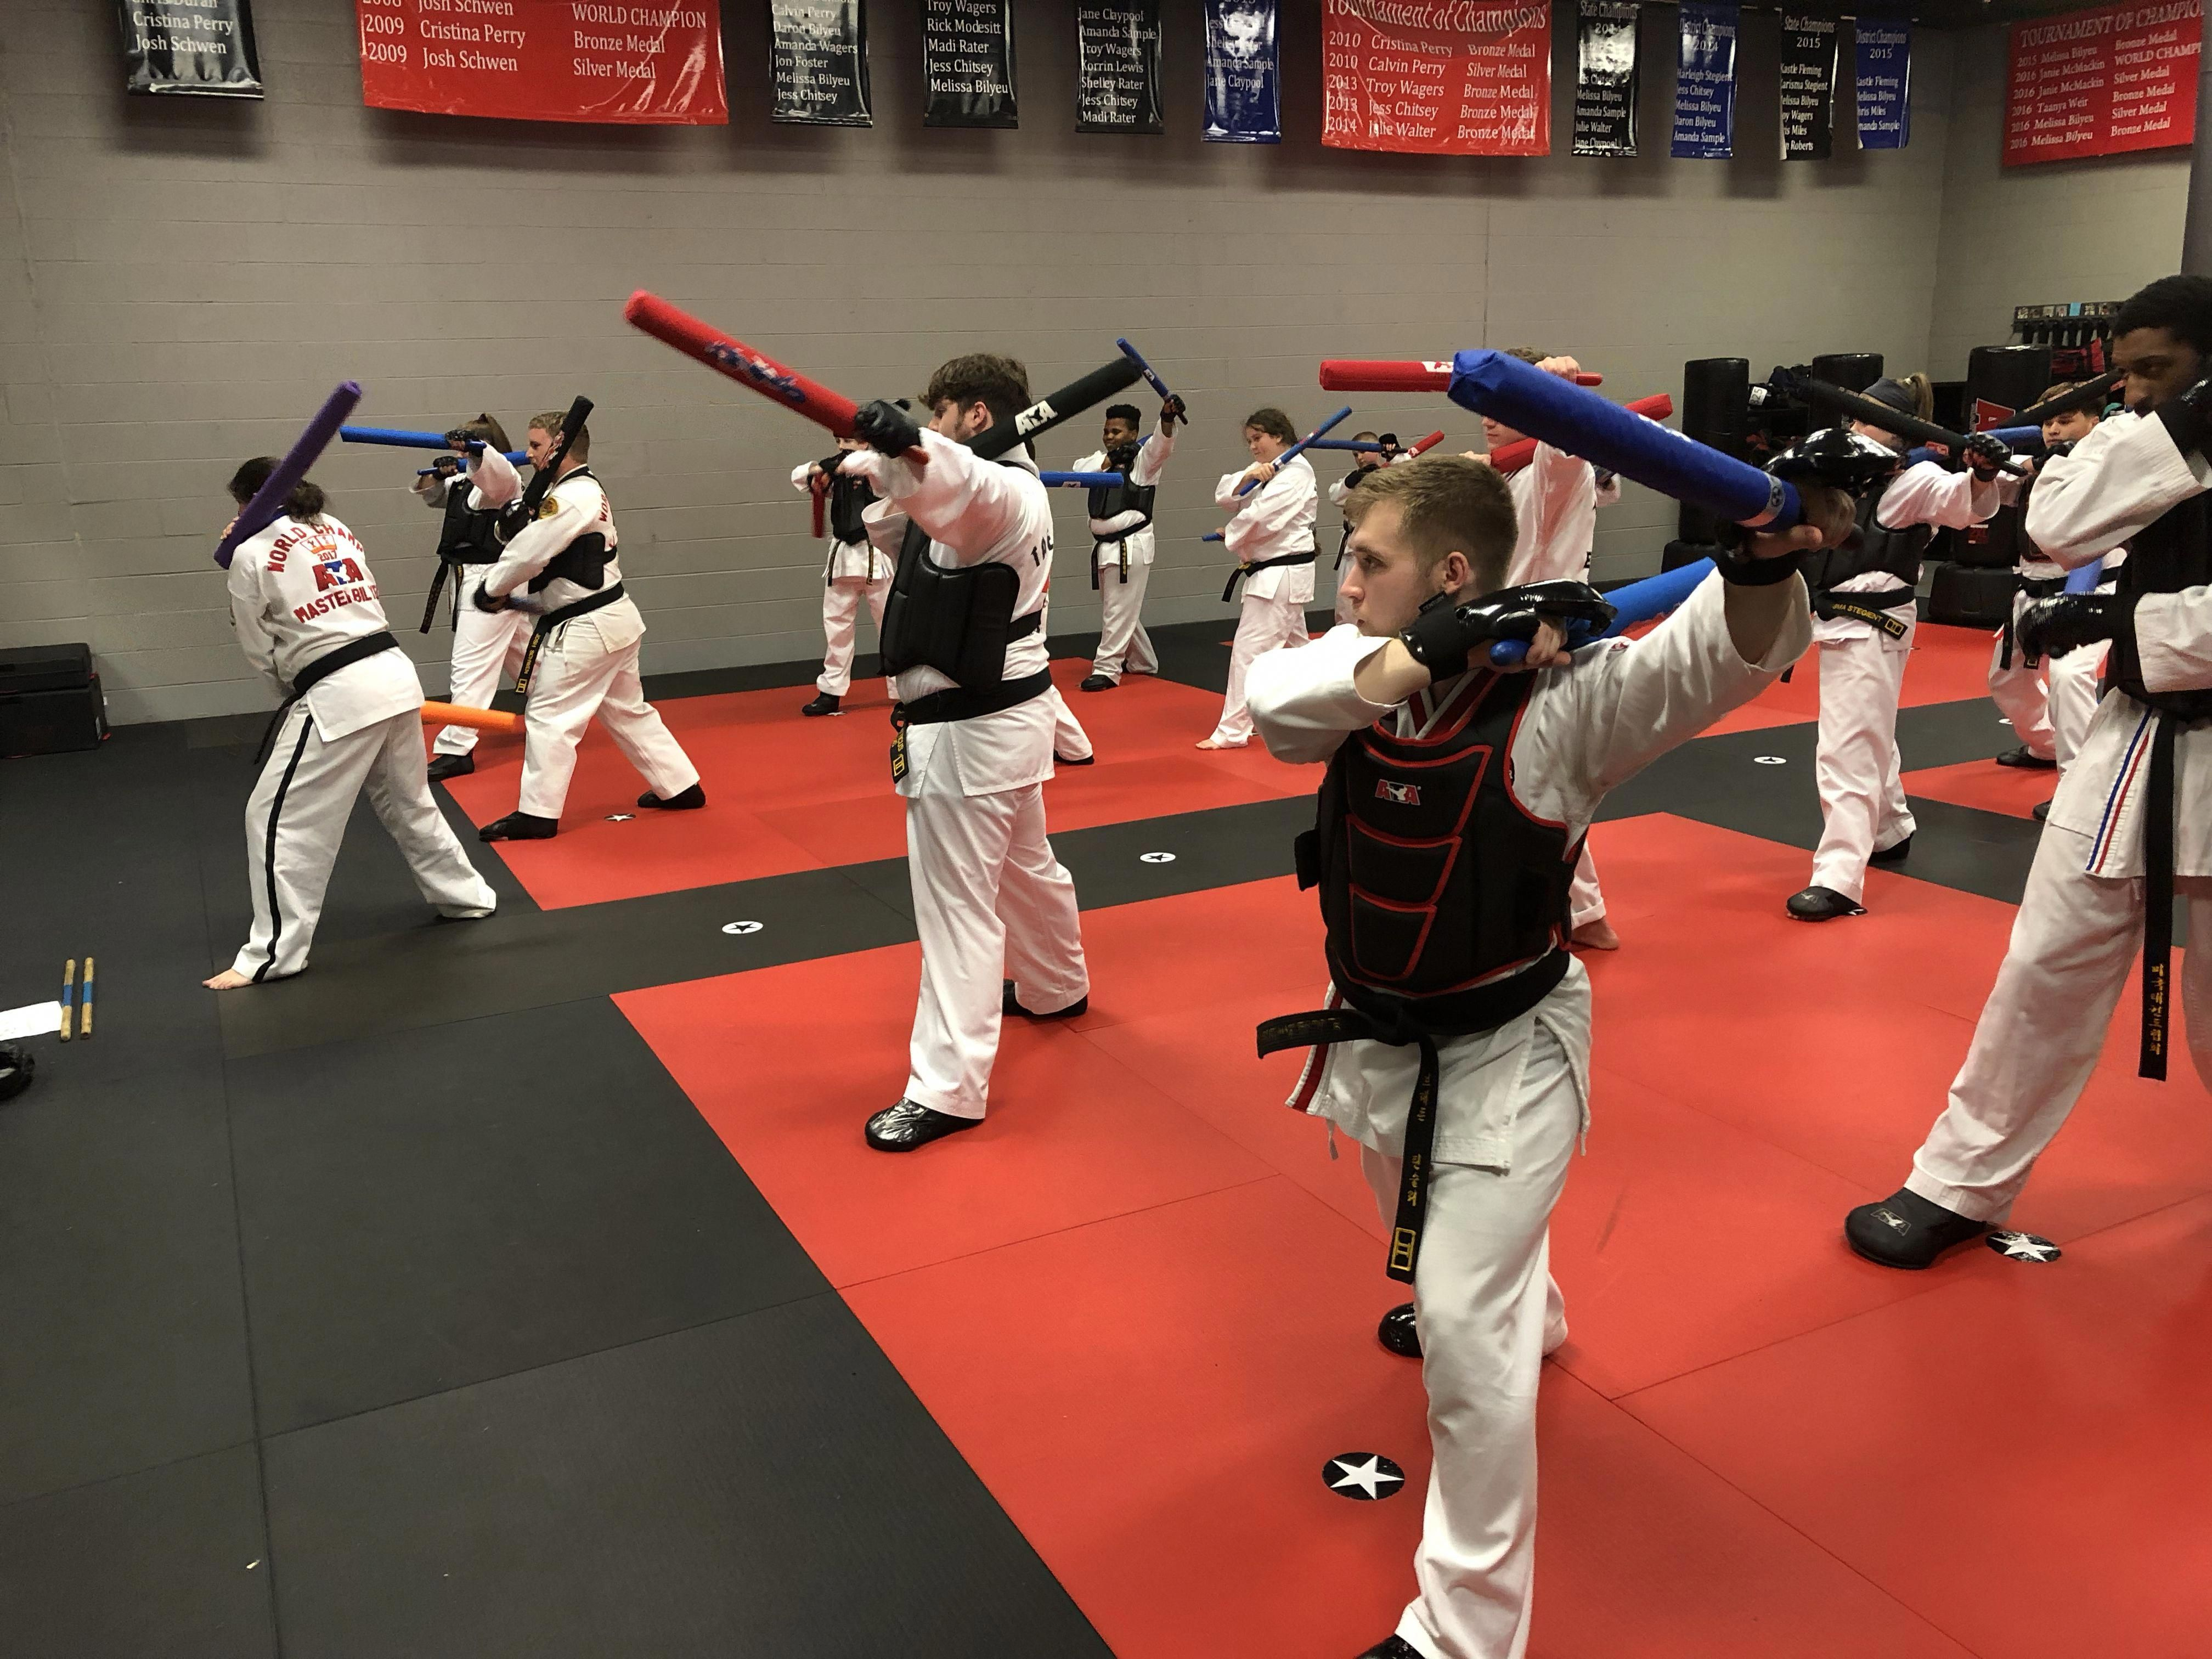 Ami nivs 10 principles of krav maga martial arts krav maga